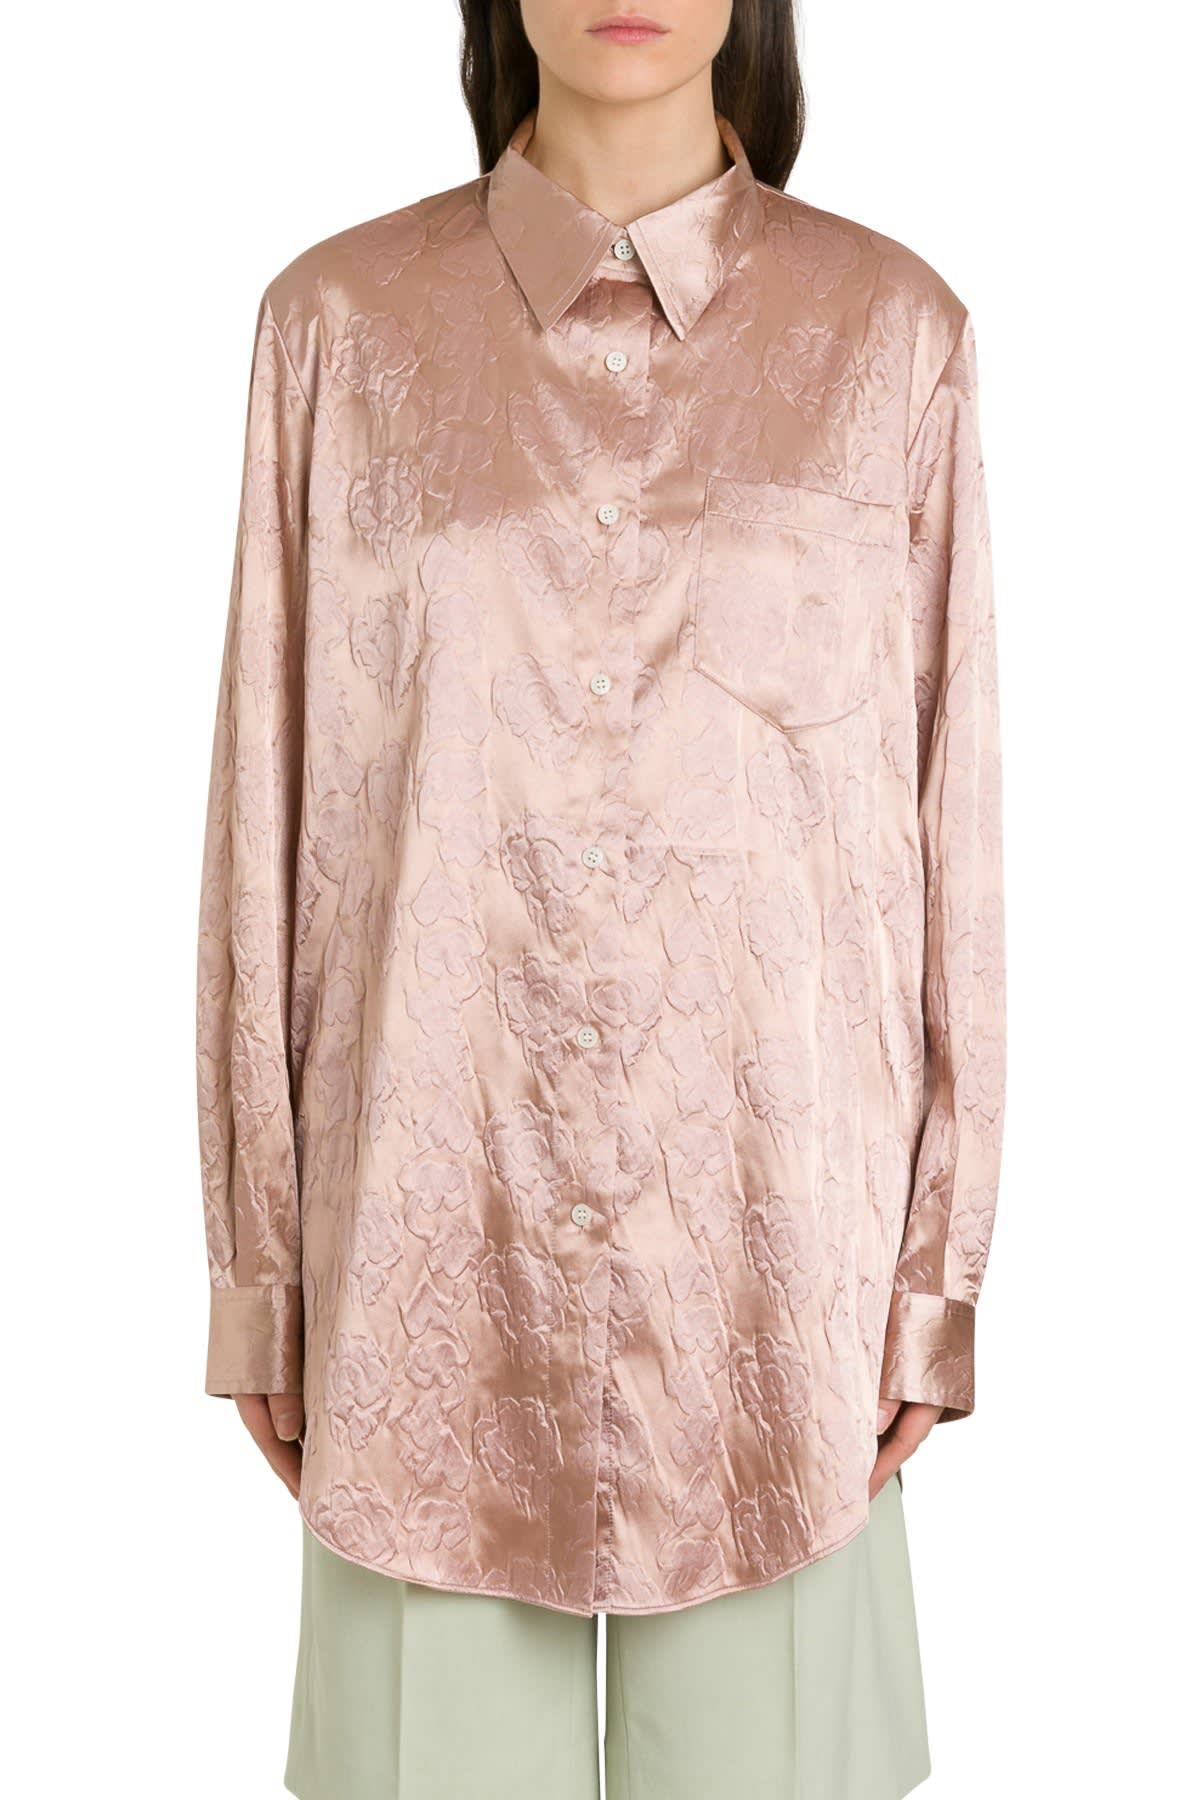 Acne Studios Sophi Shirt With Embossed Floral Motif